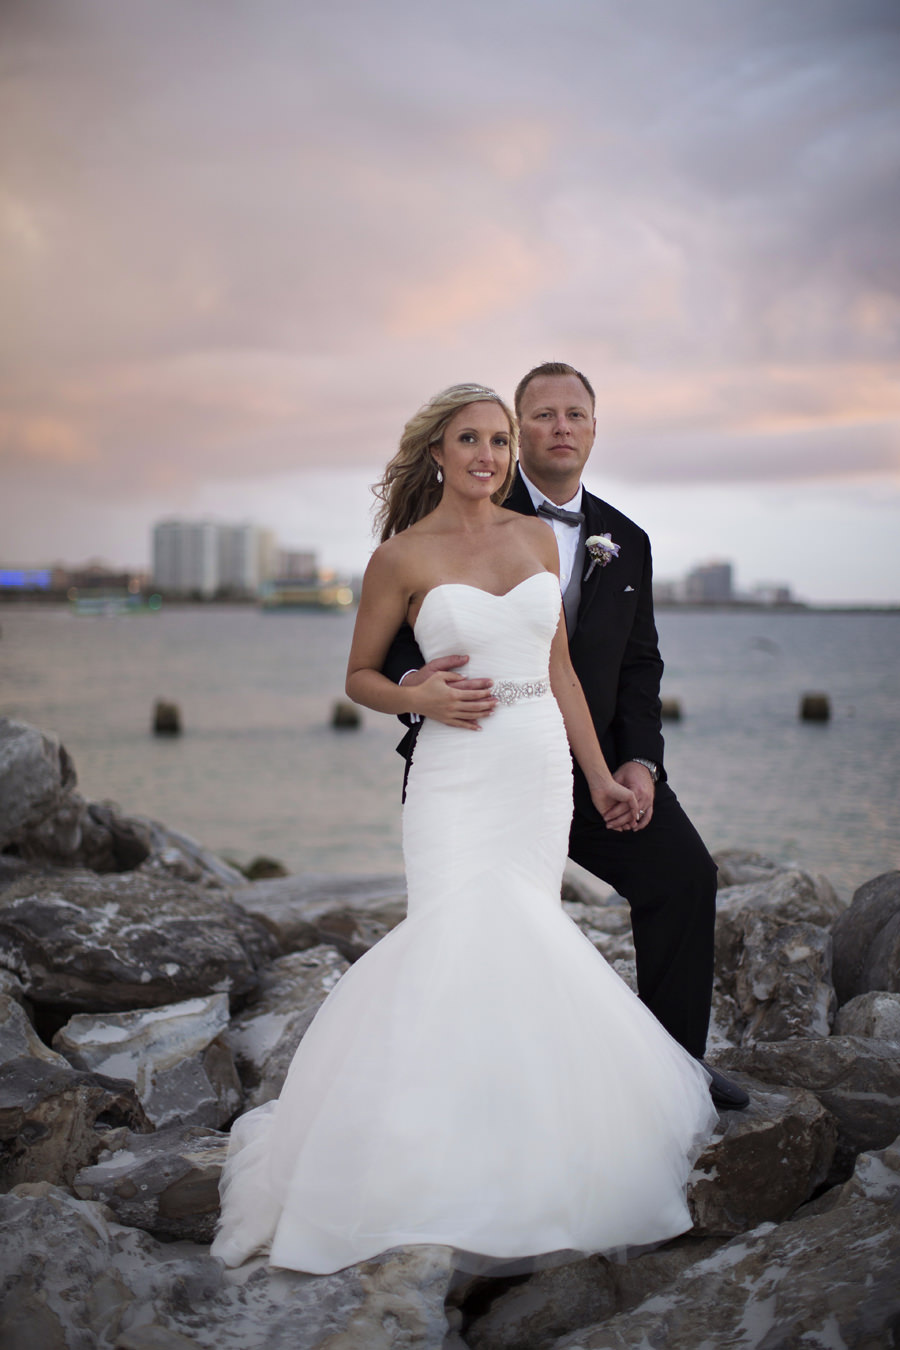 Bridal and Groom Outdoor Sunset Wedding Portrait on Rocks | Clearwater Beach Wedding Photographer Djamel Photography